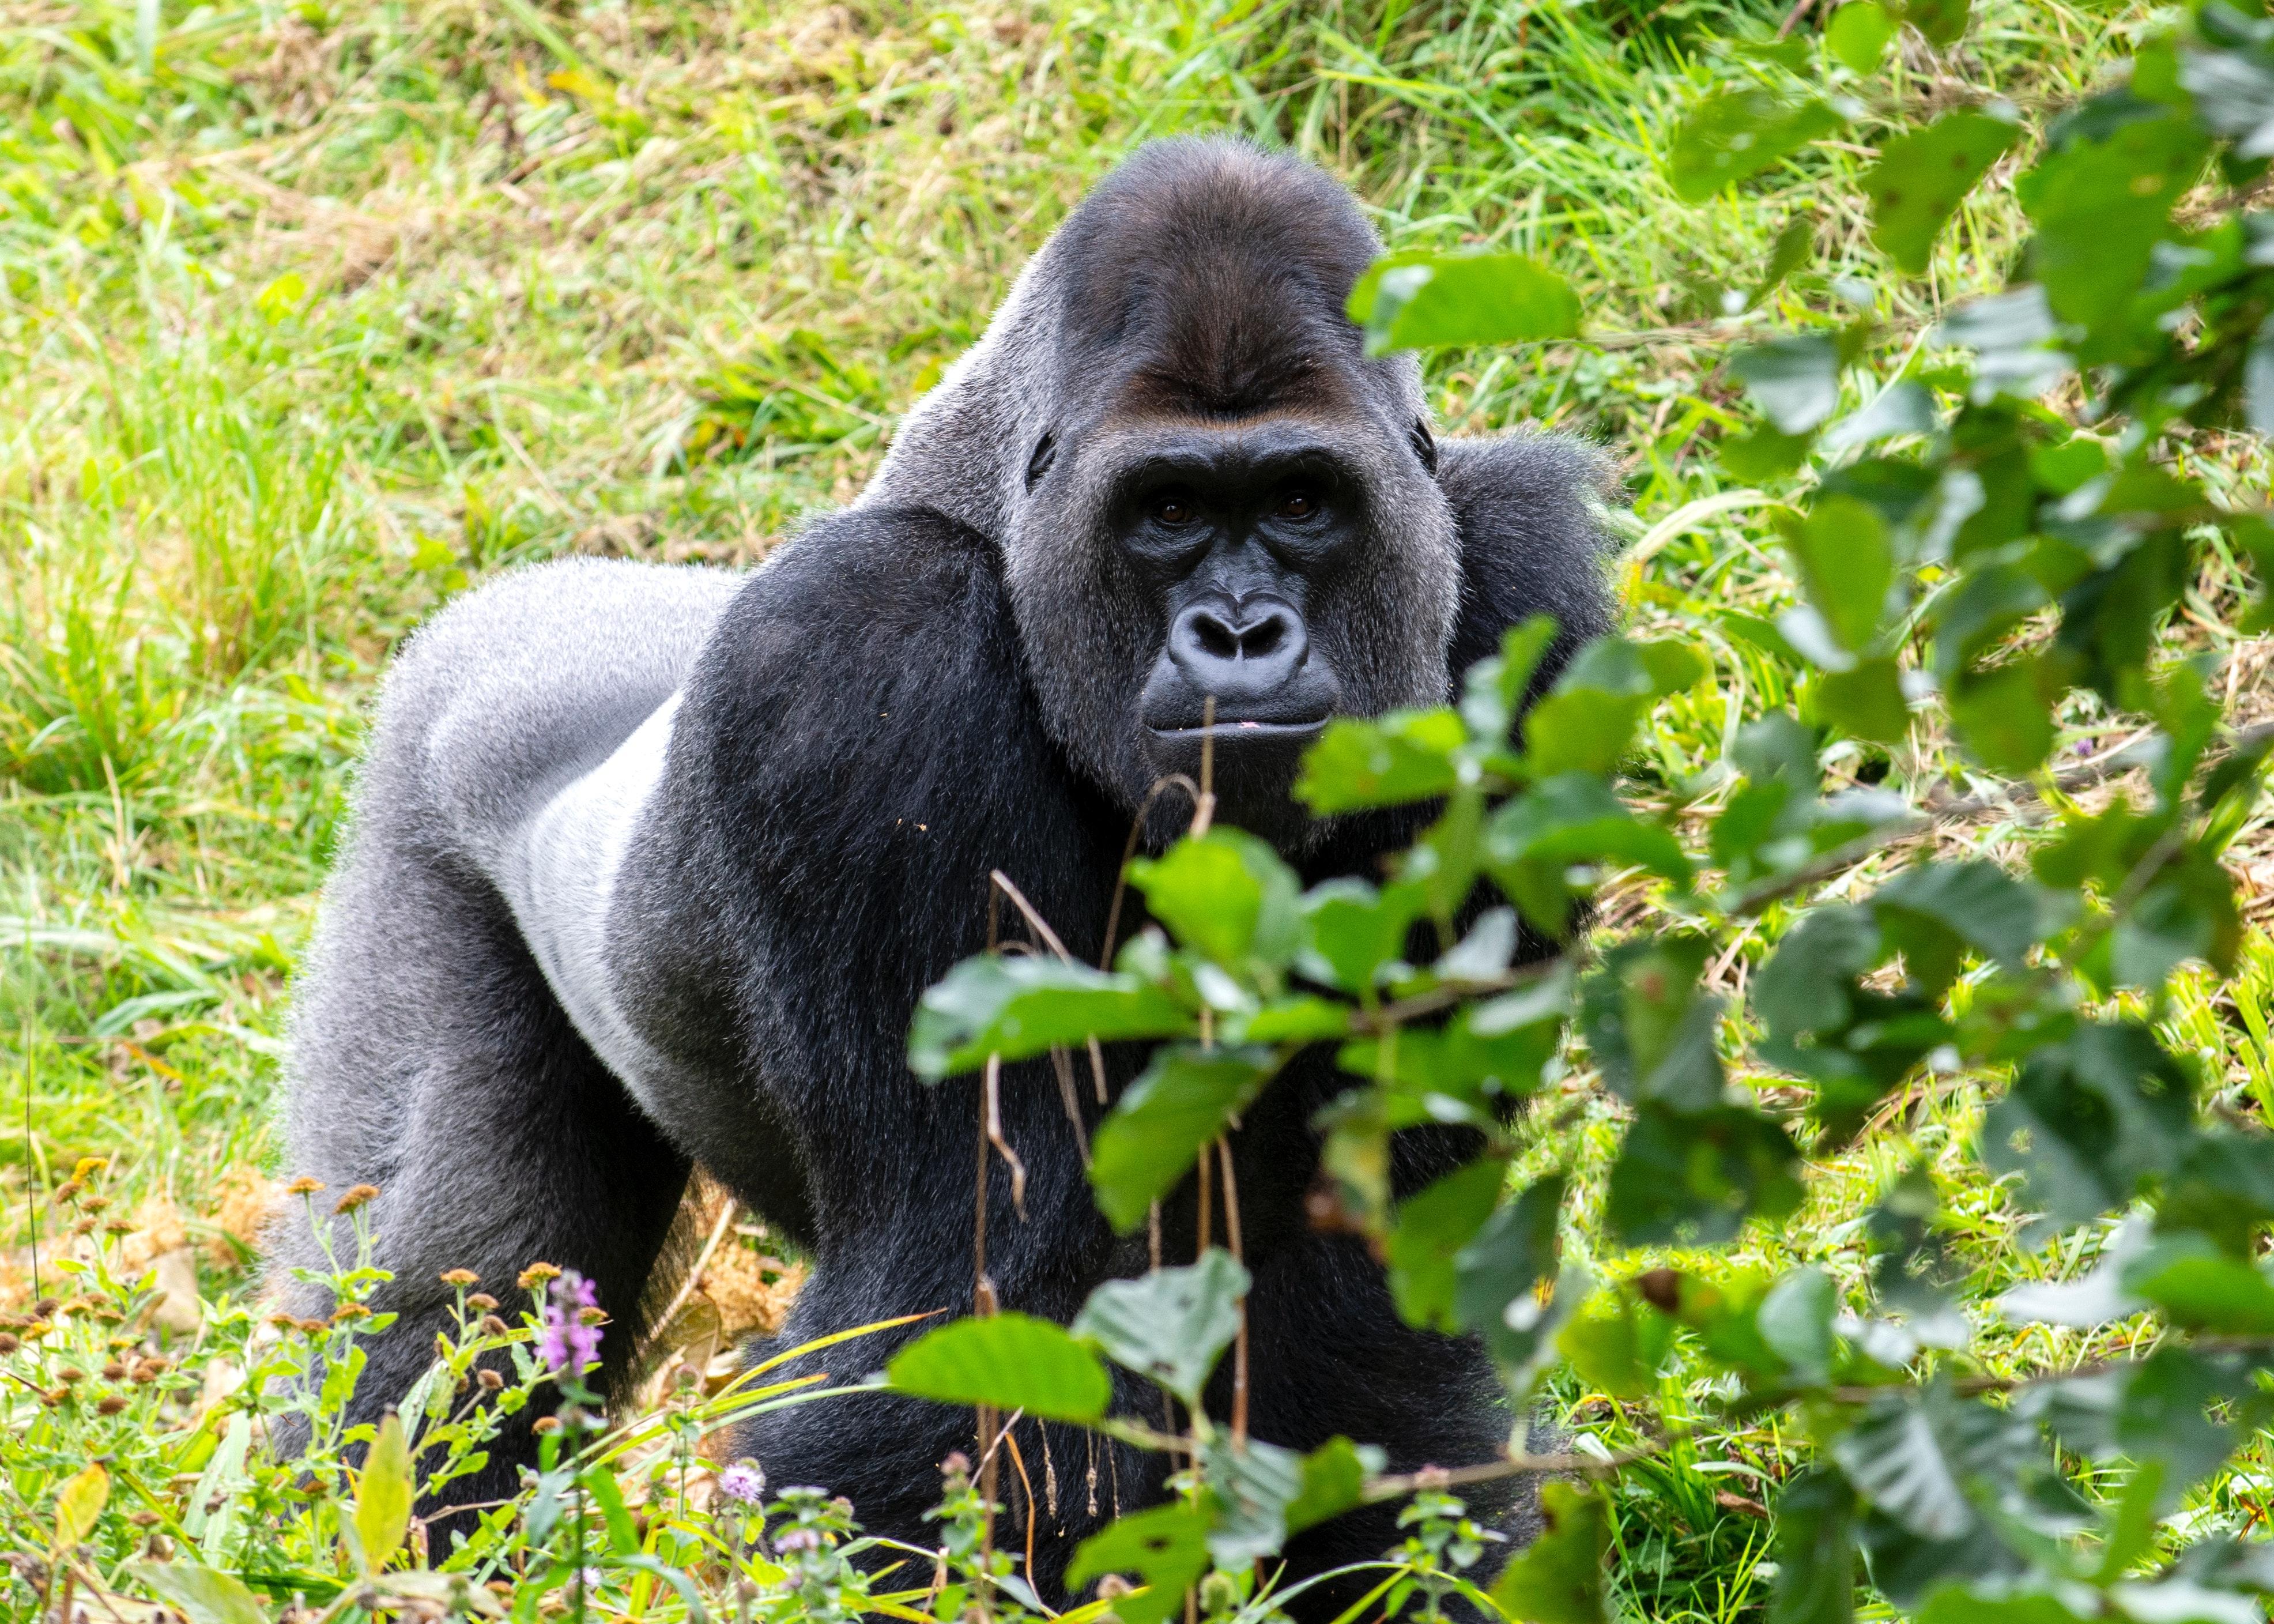 Global Gorilla Wholesales